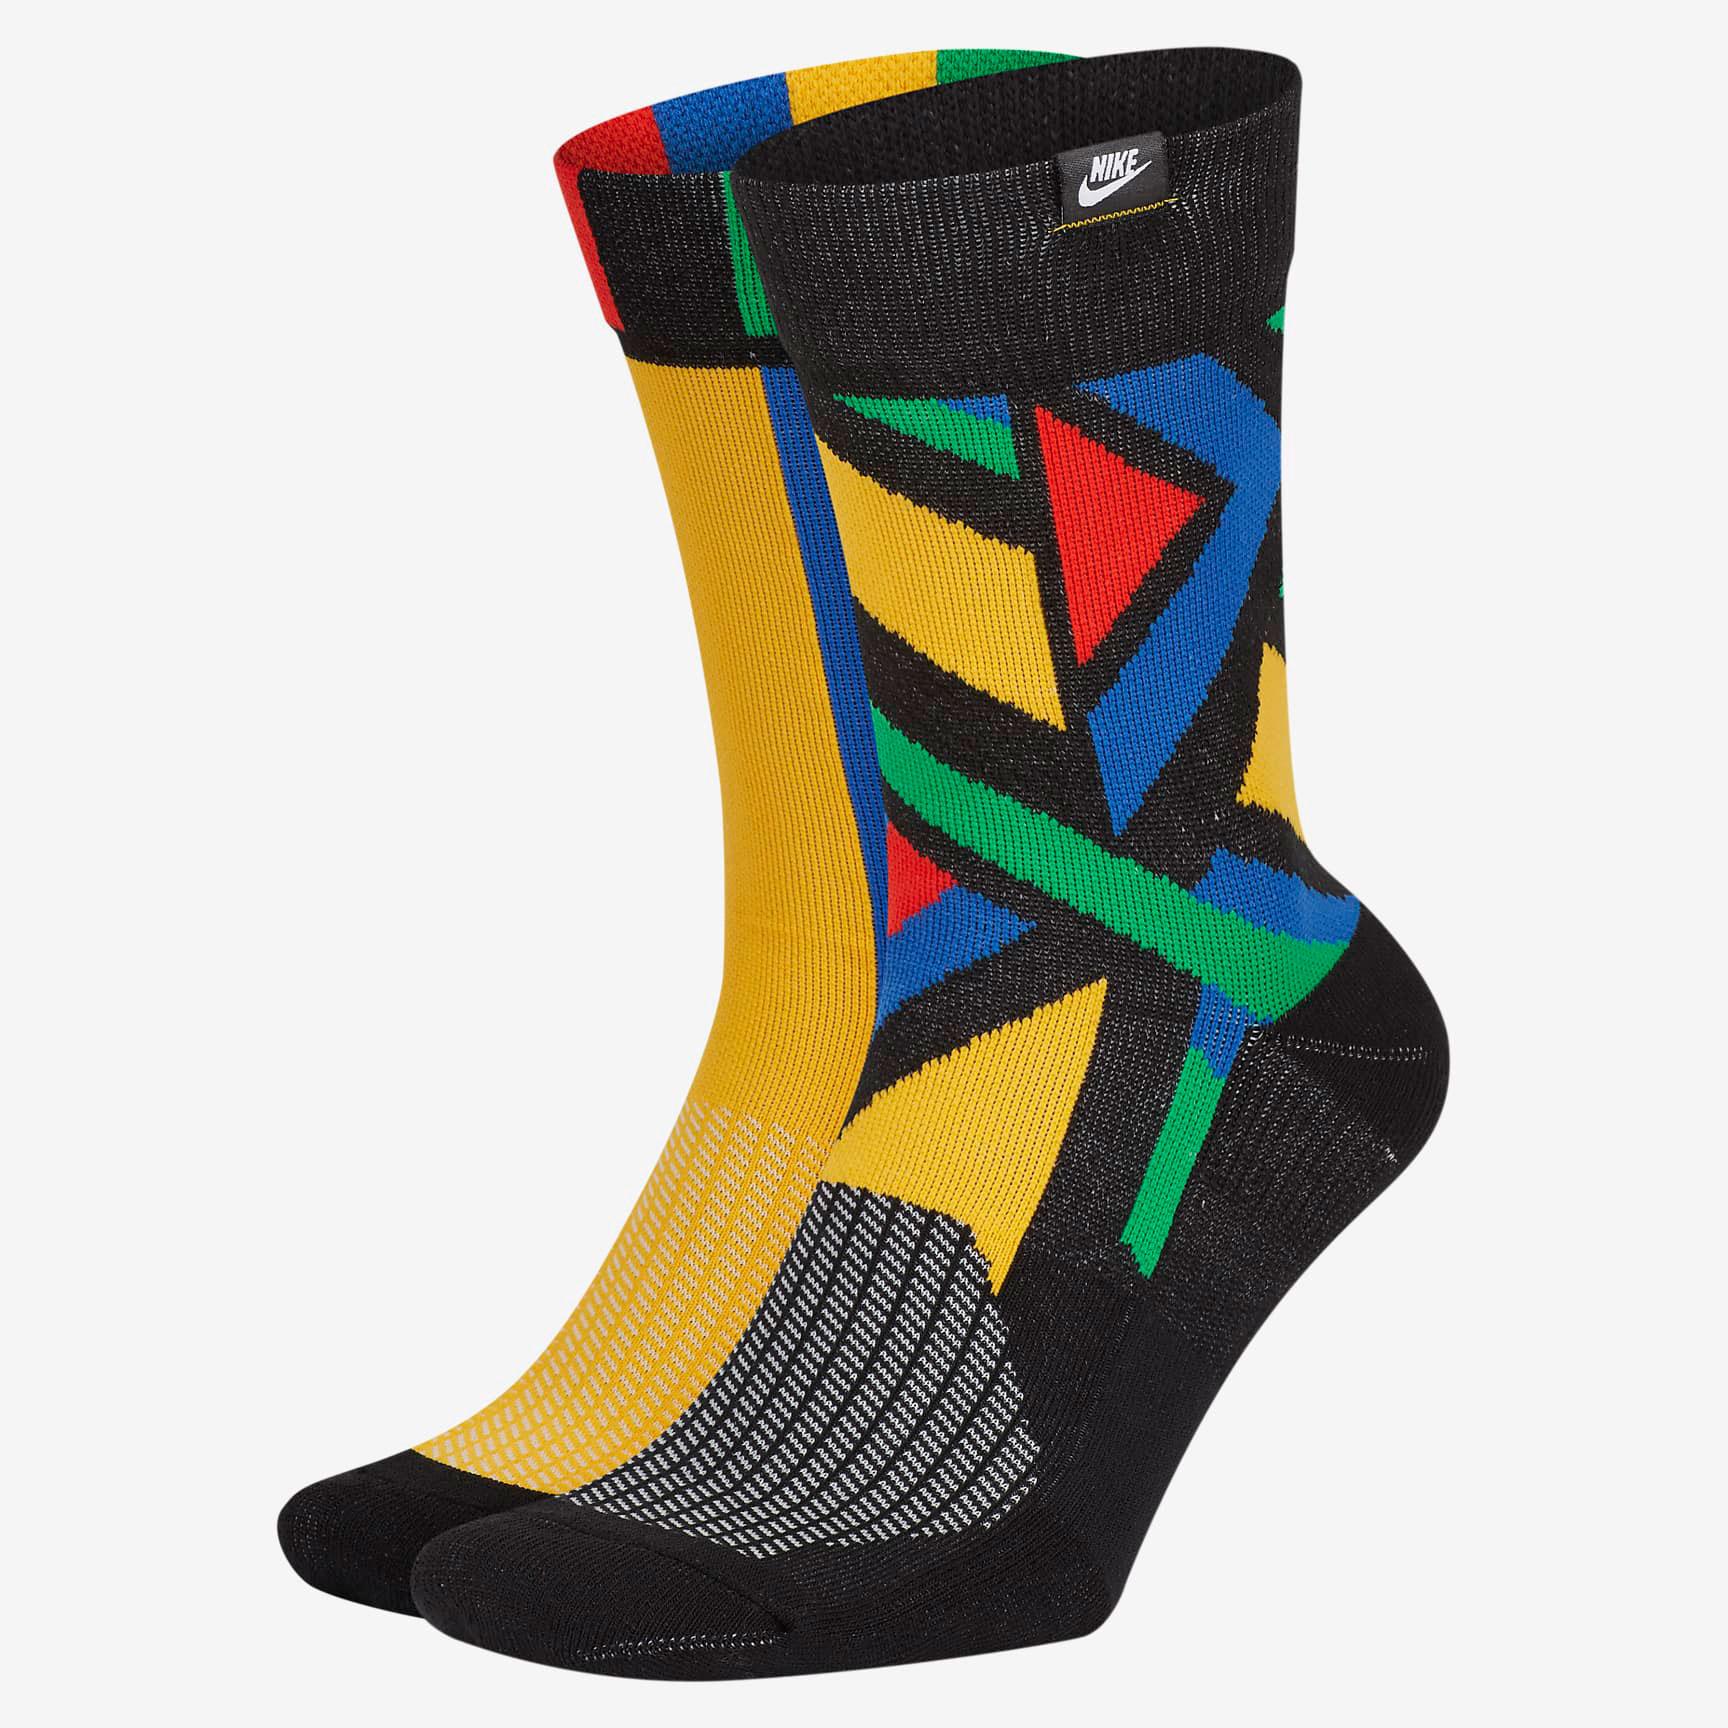 nike-urban-jungle-live-together-play-together-socks-1